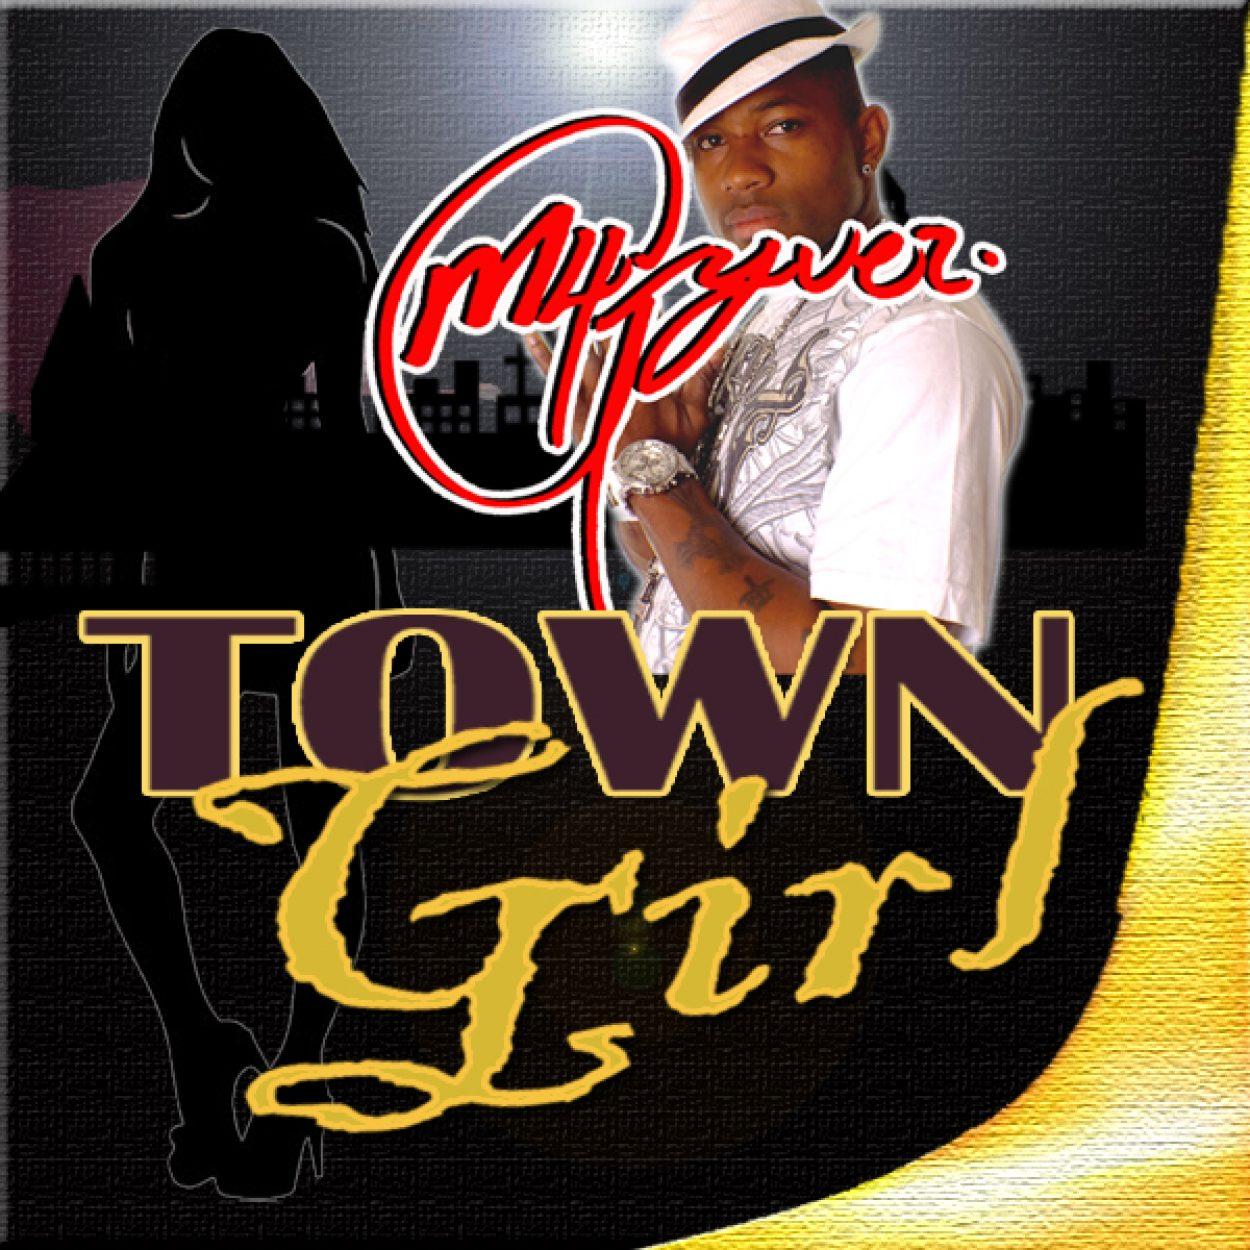 TOWN GIRL